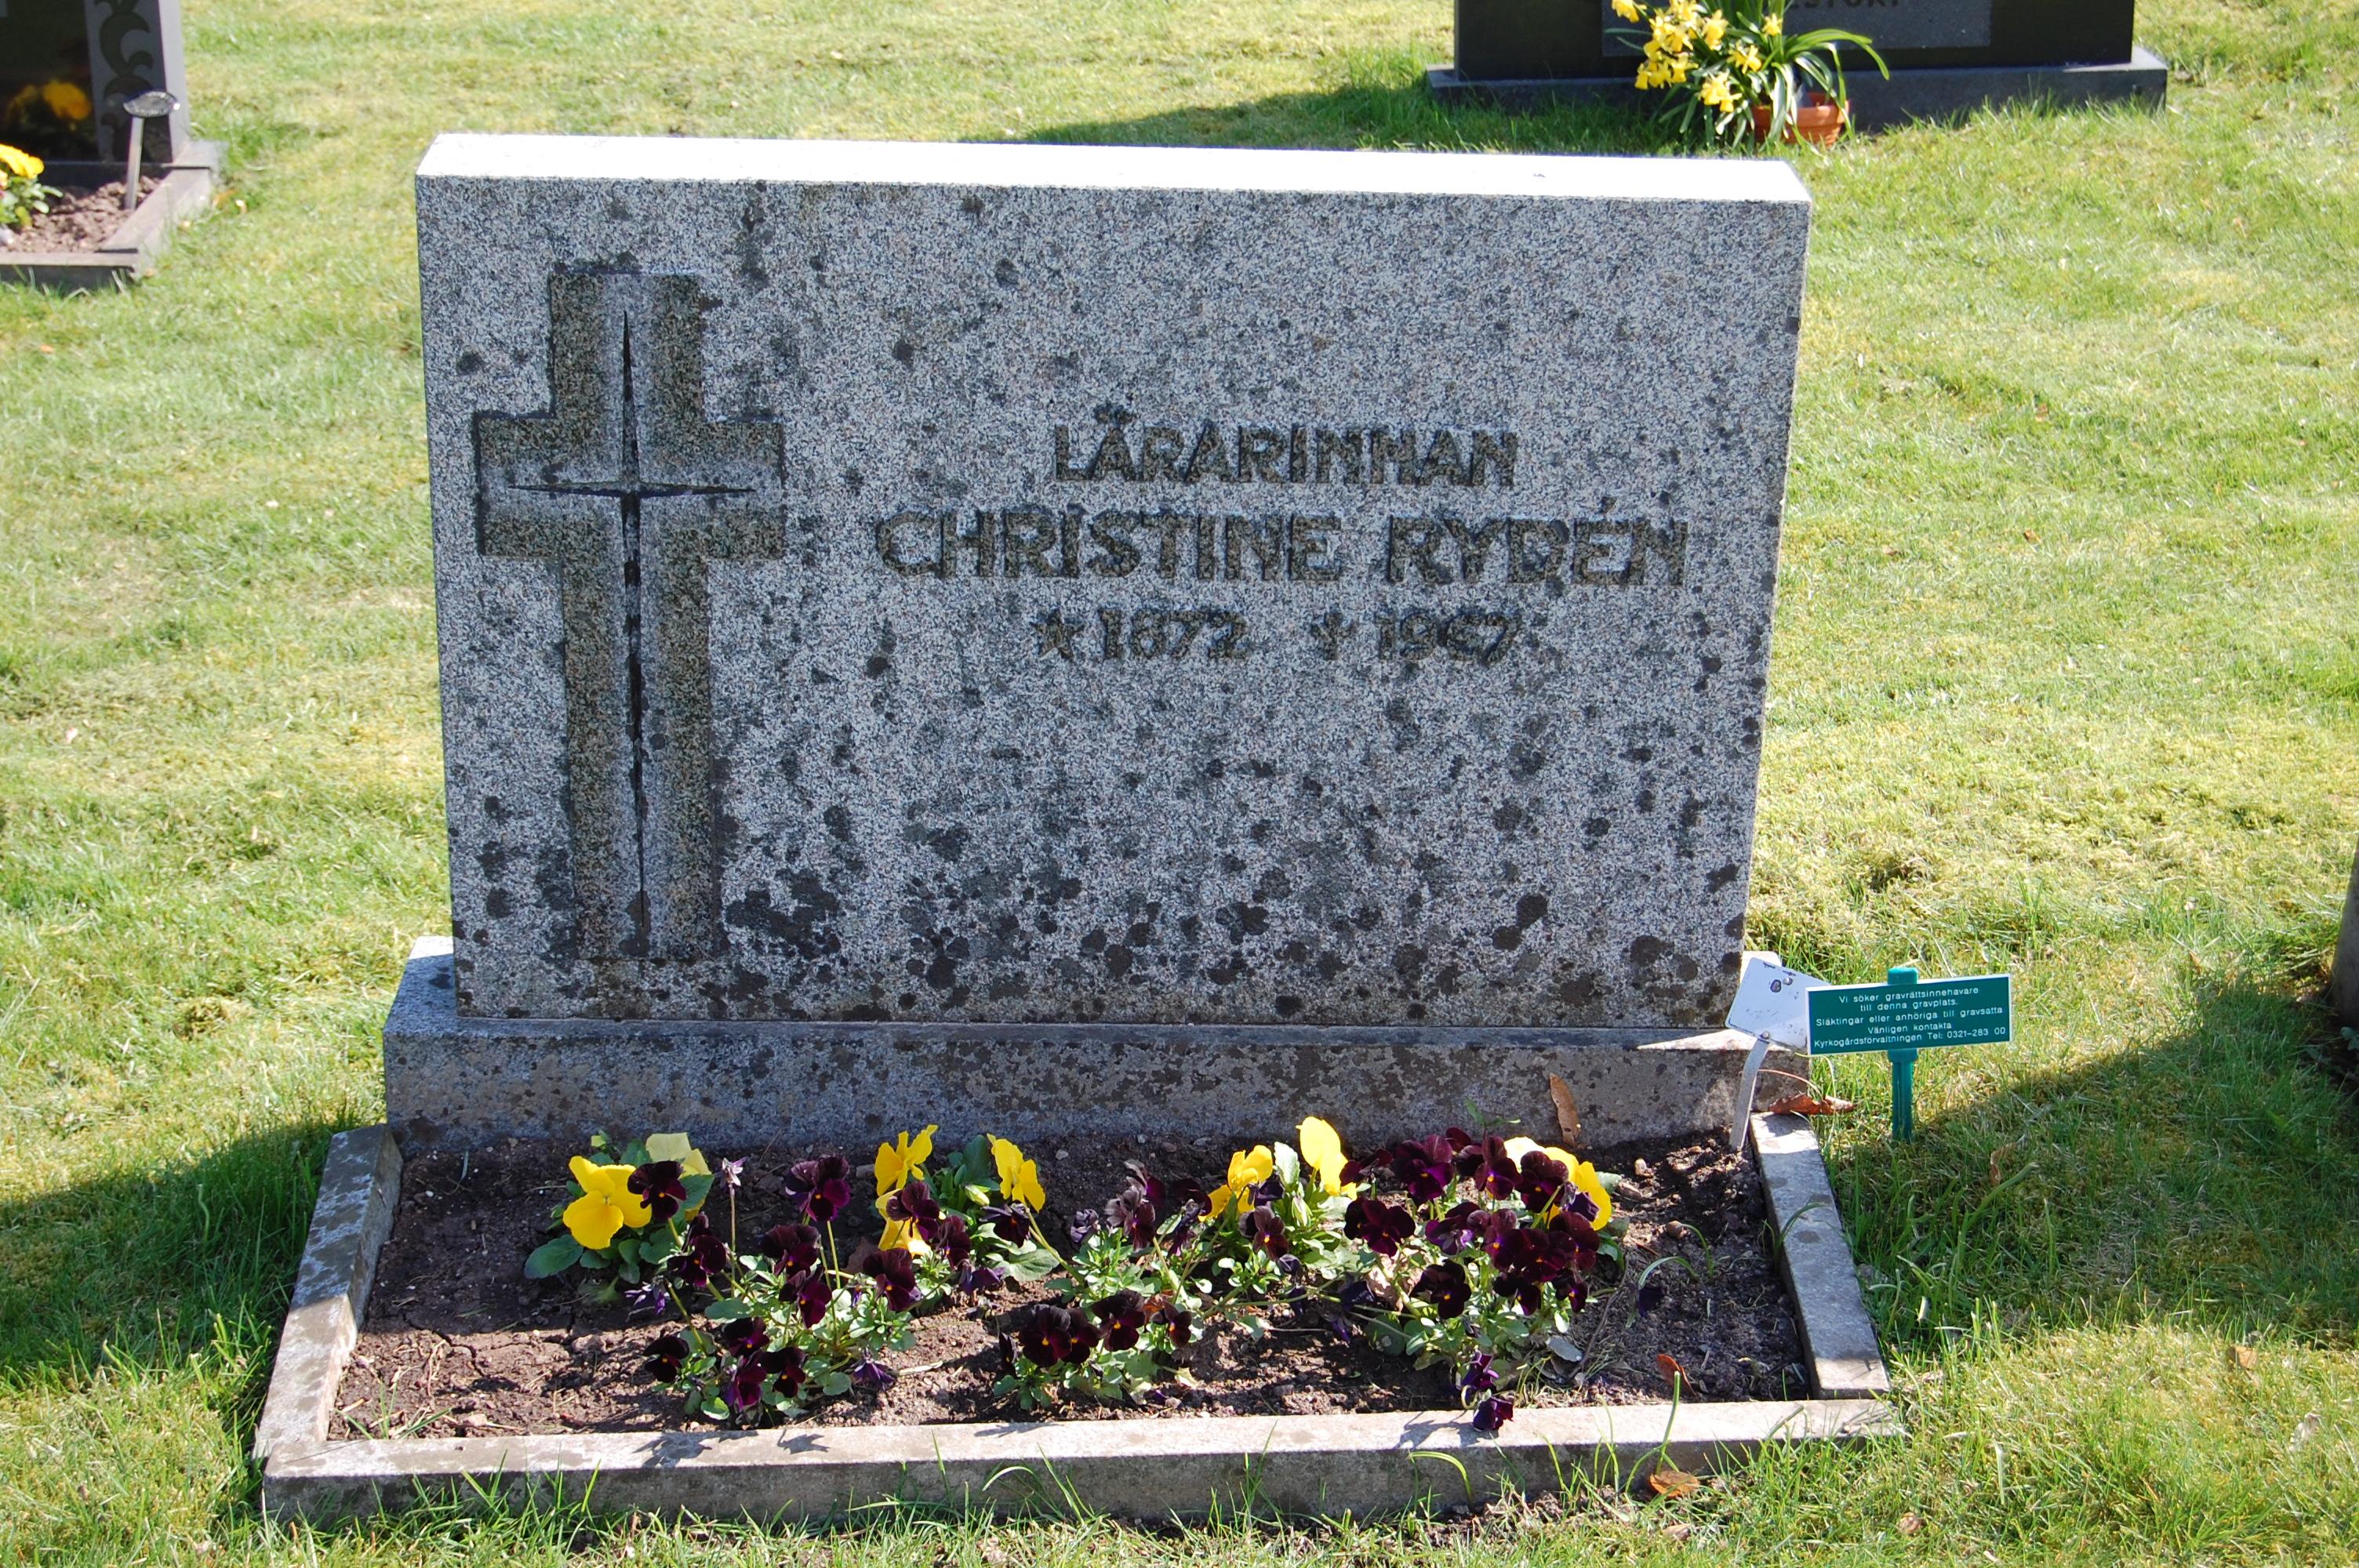 Christine Ryden, 2